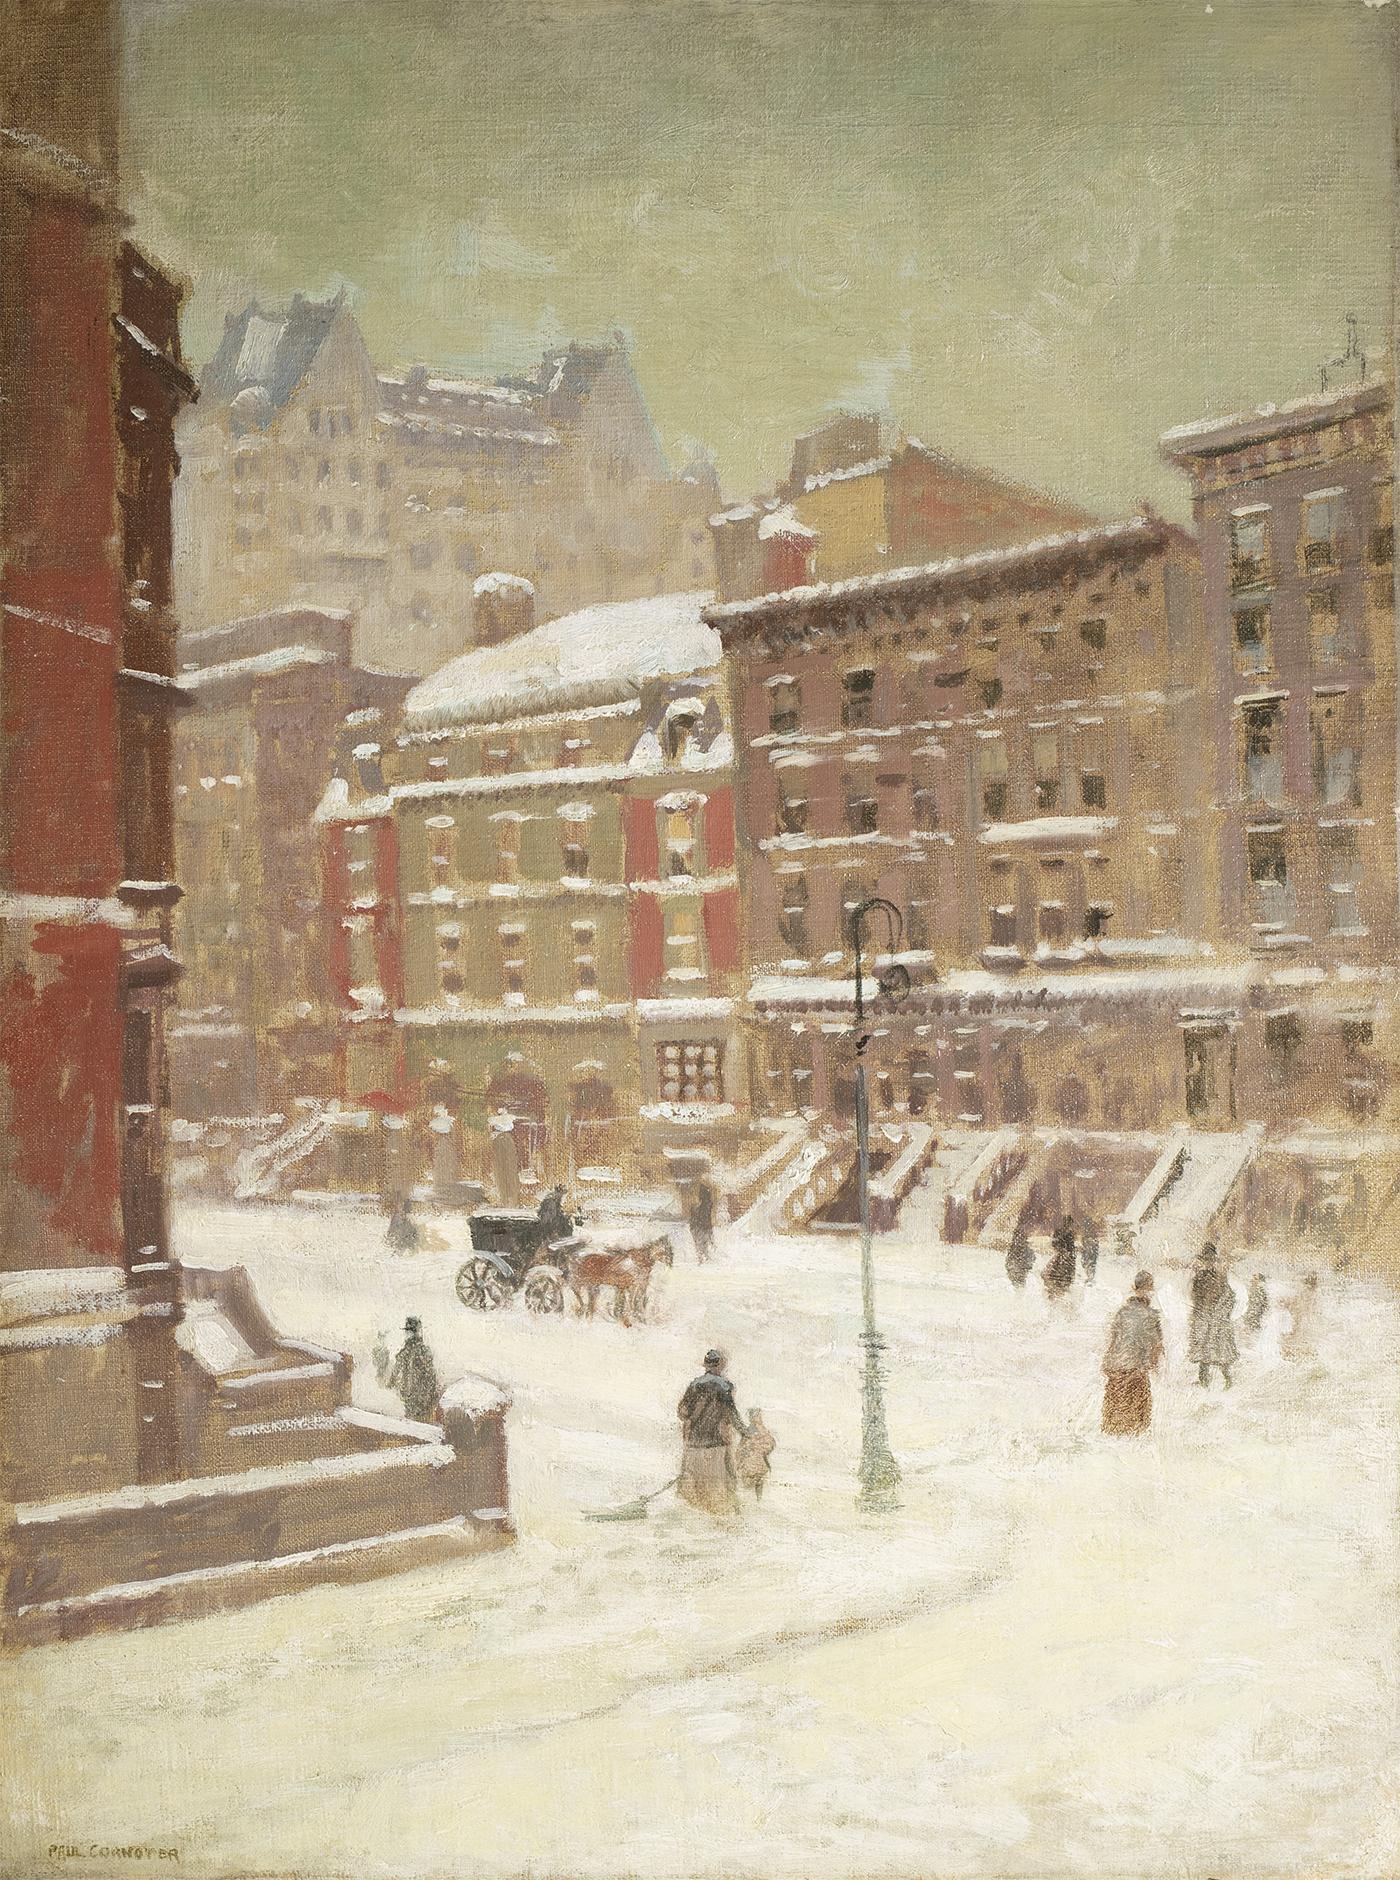 Cornoyer-New York City View in Winter